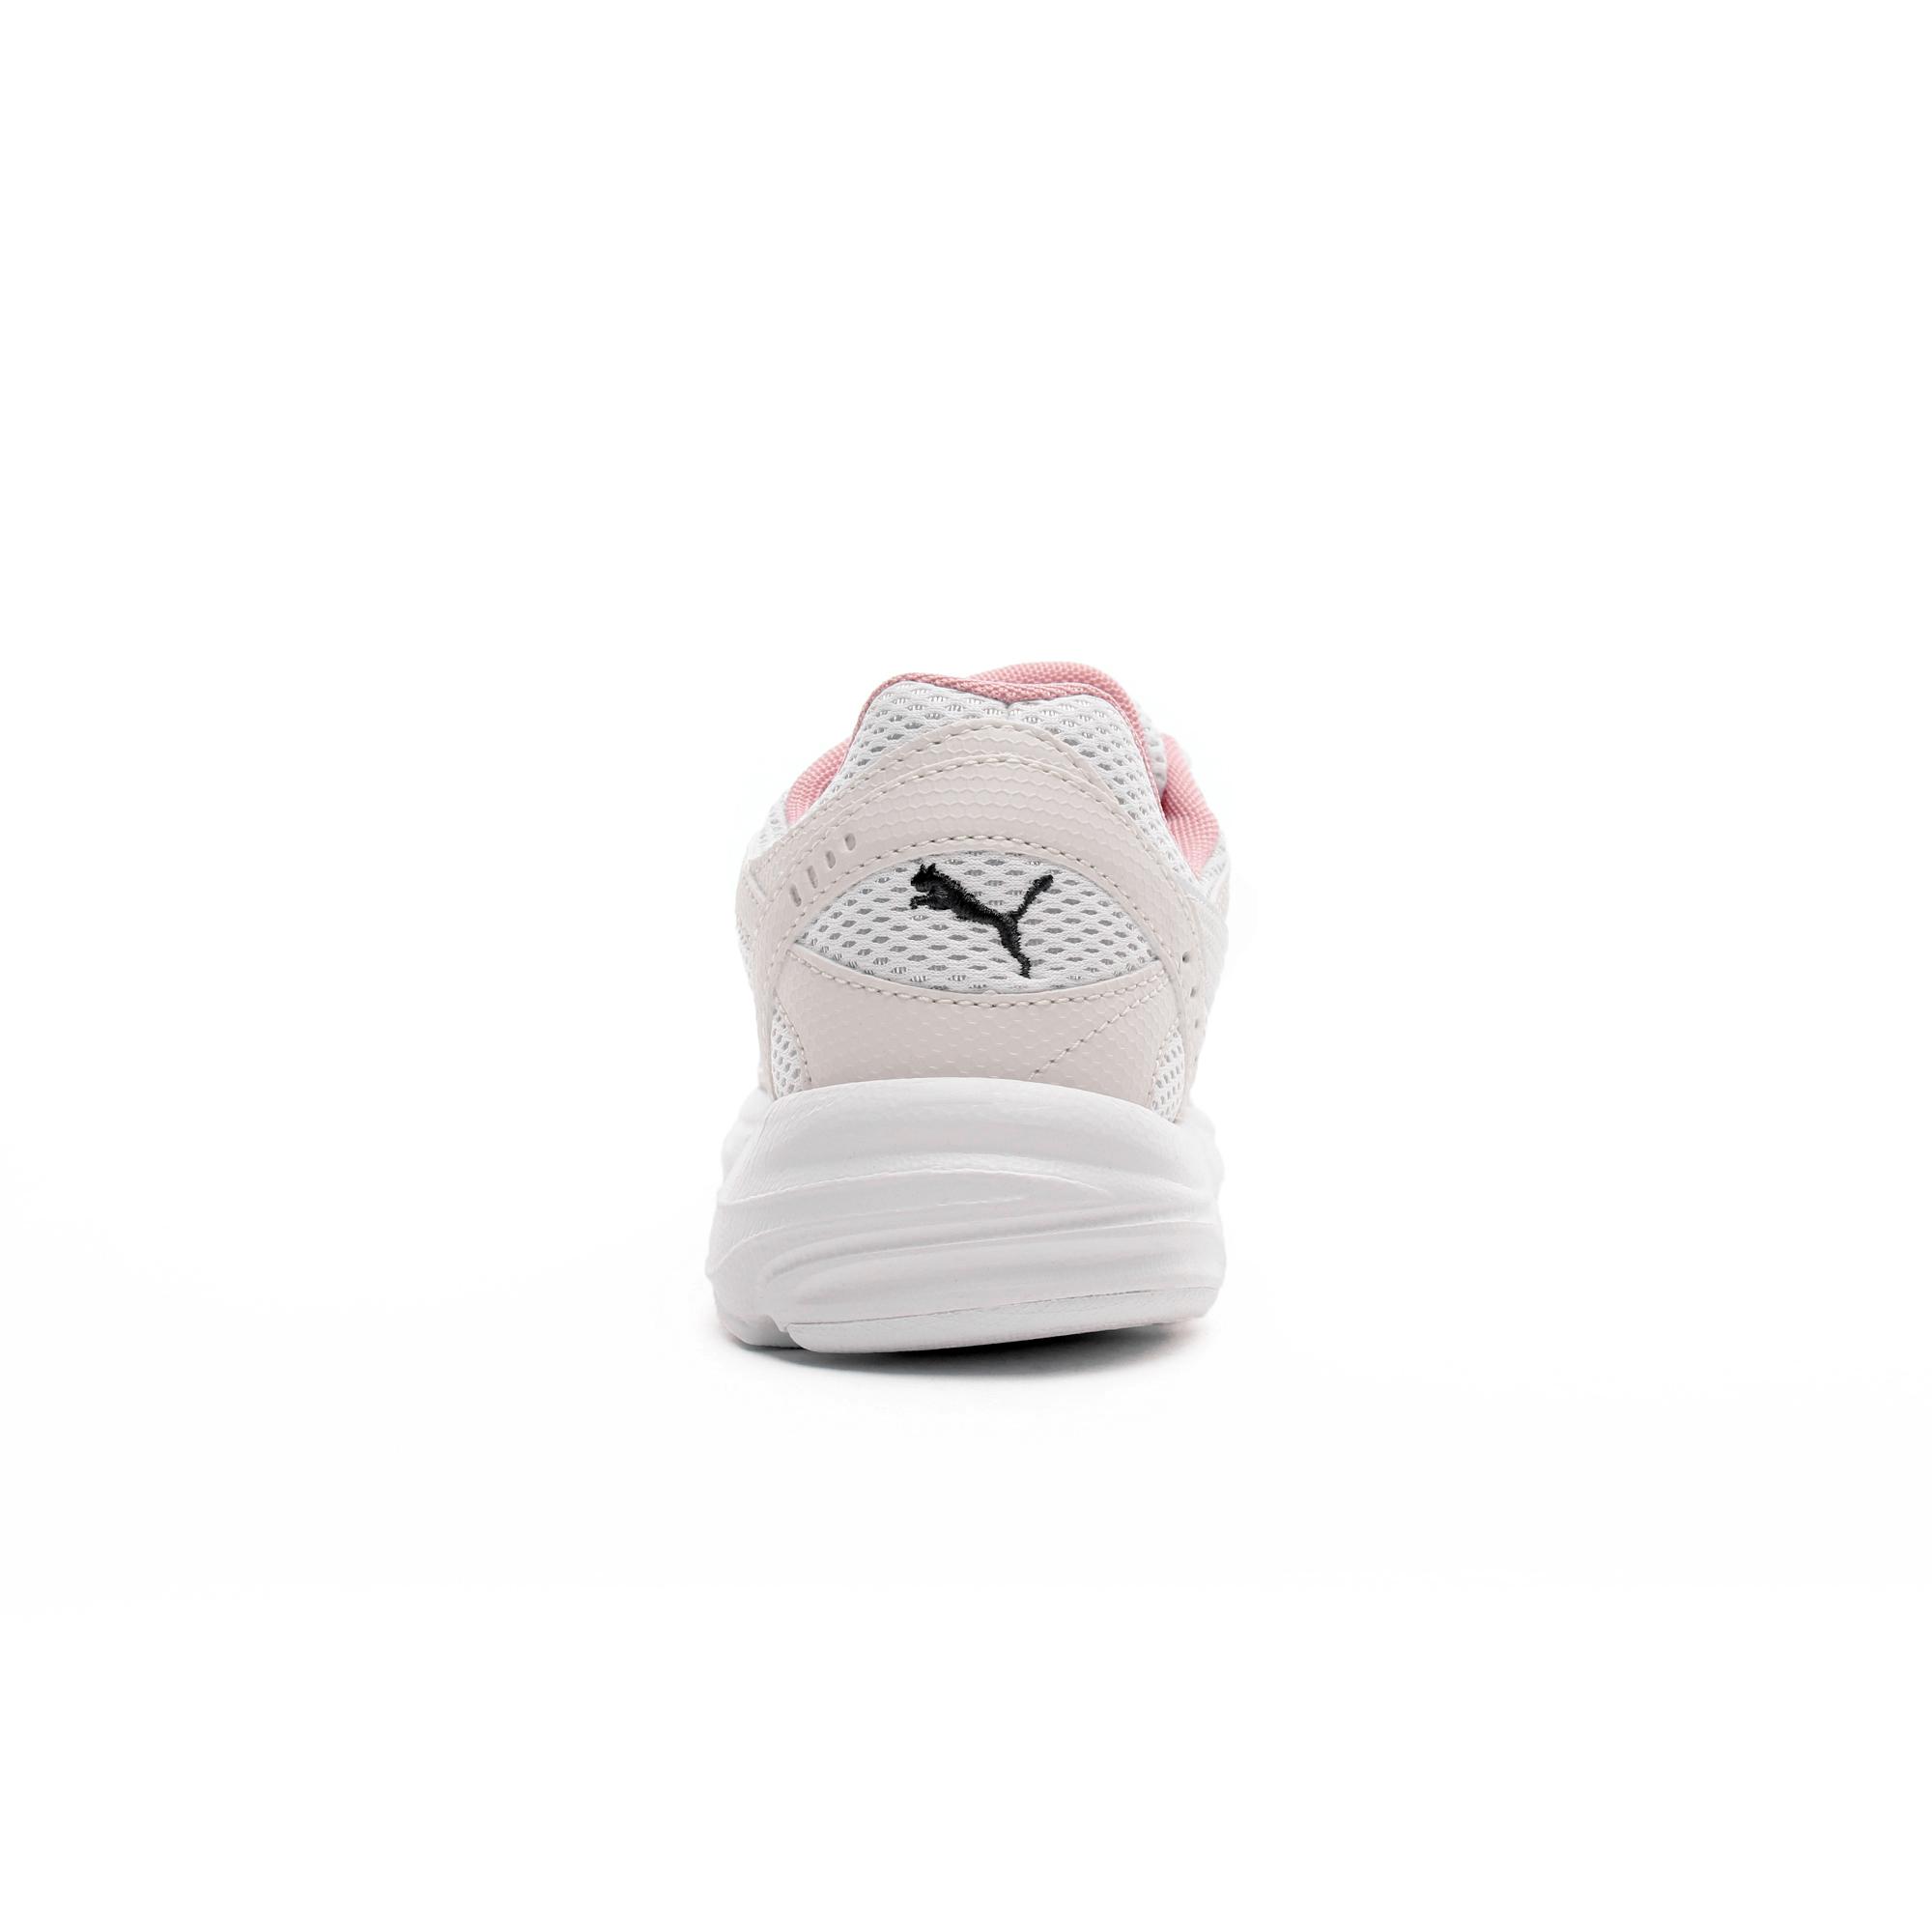 Puma Axis Kadın Pembe Spor Ayakkabı